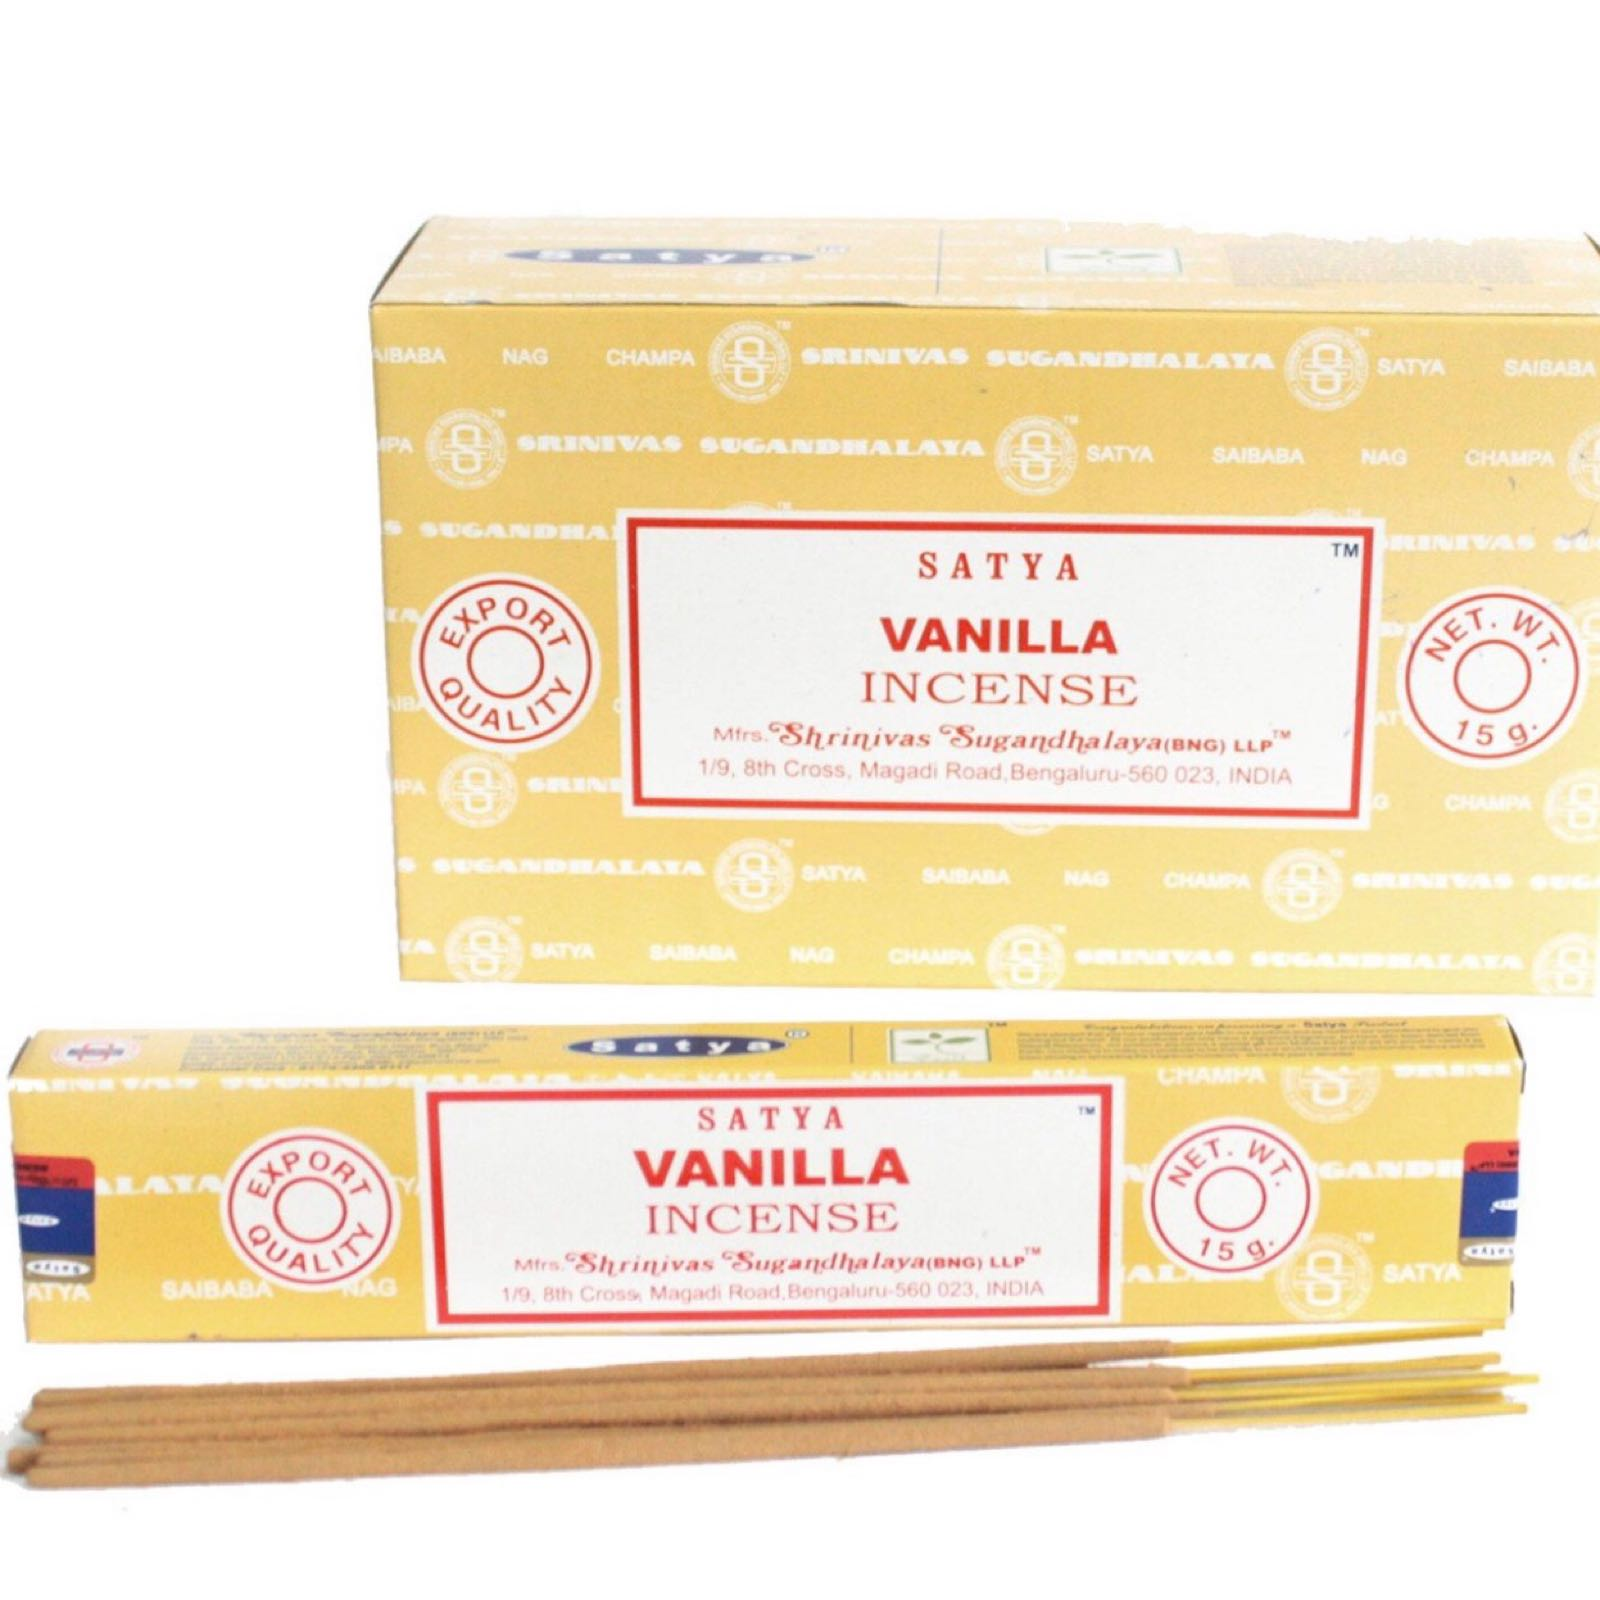 'Vanilla' Incense Sticks